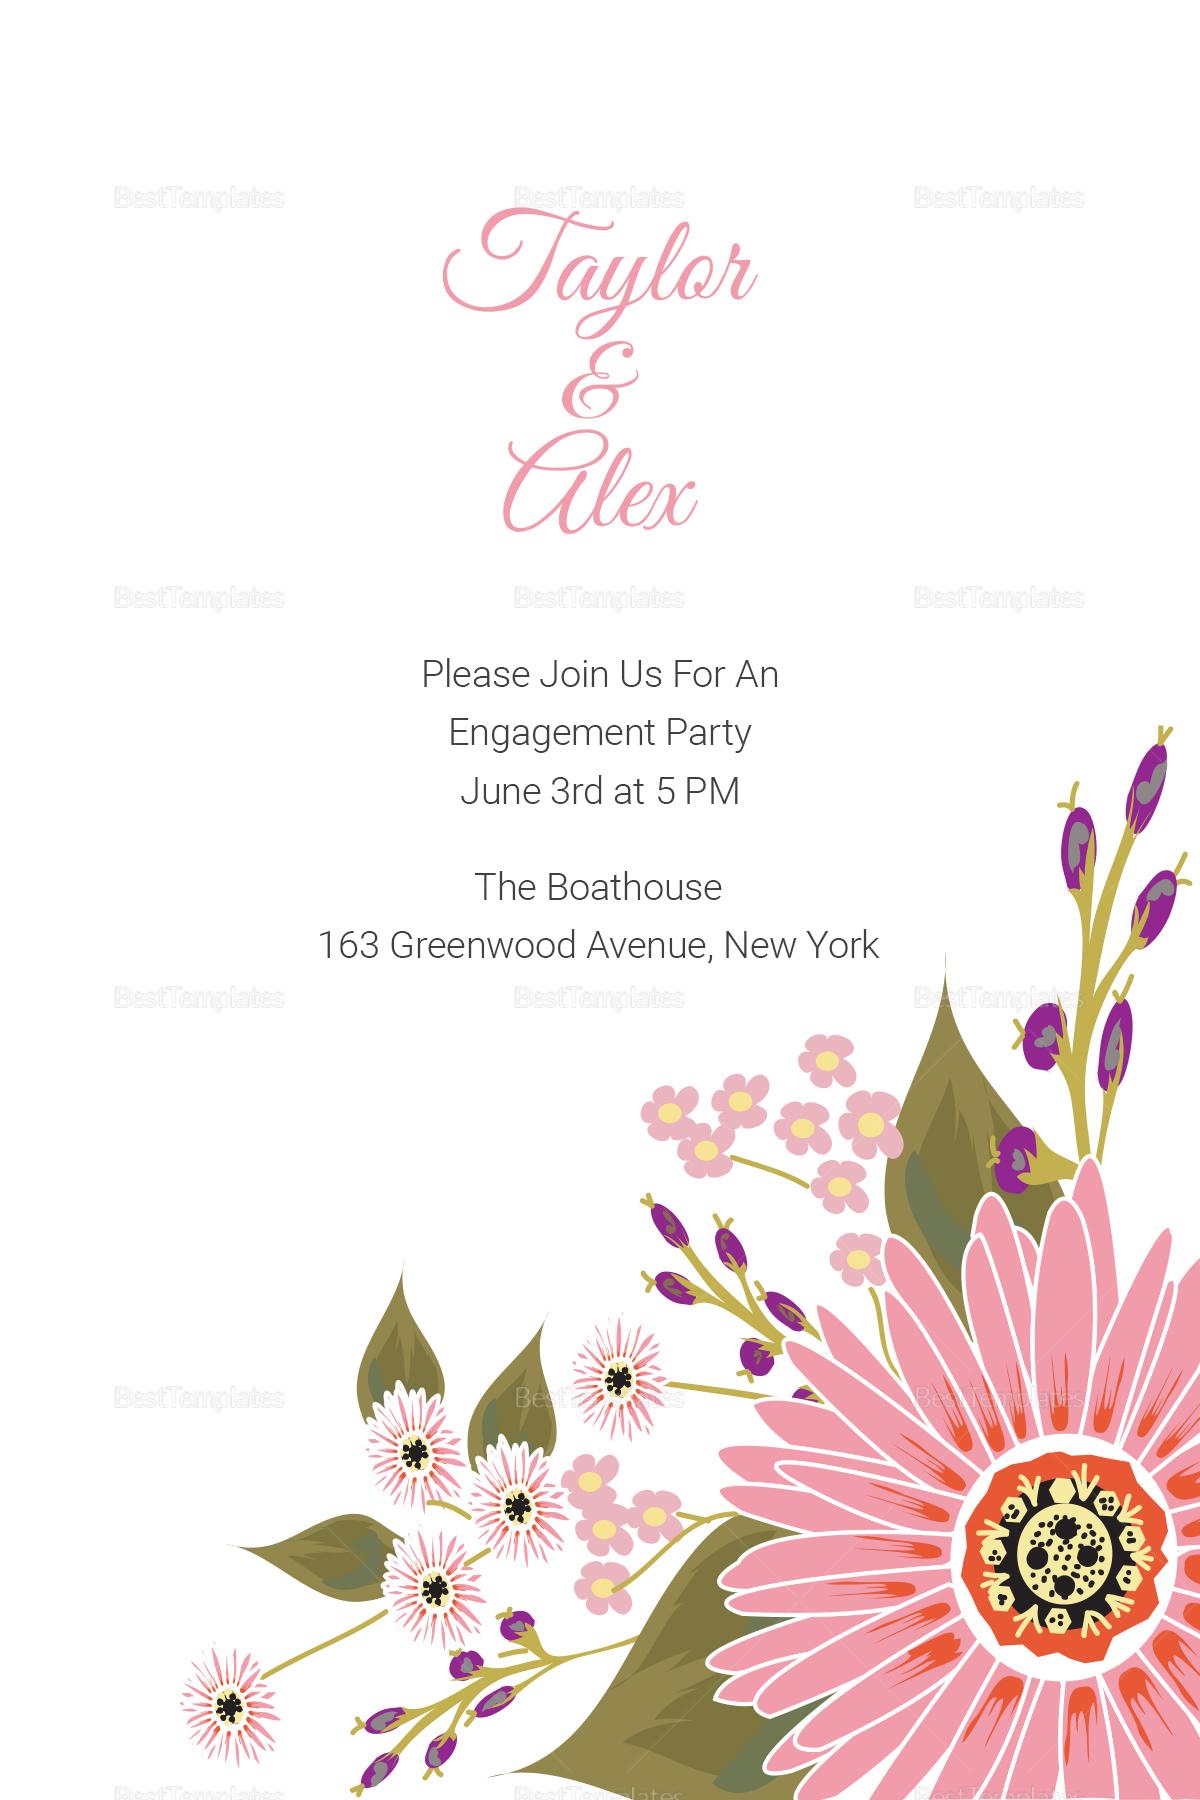 Engagement Announcement Card Design Template